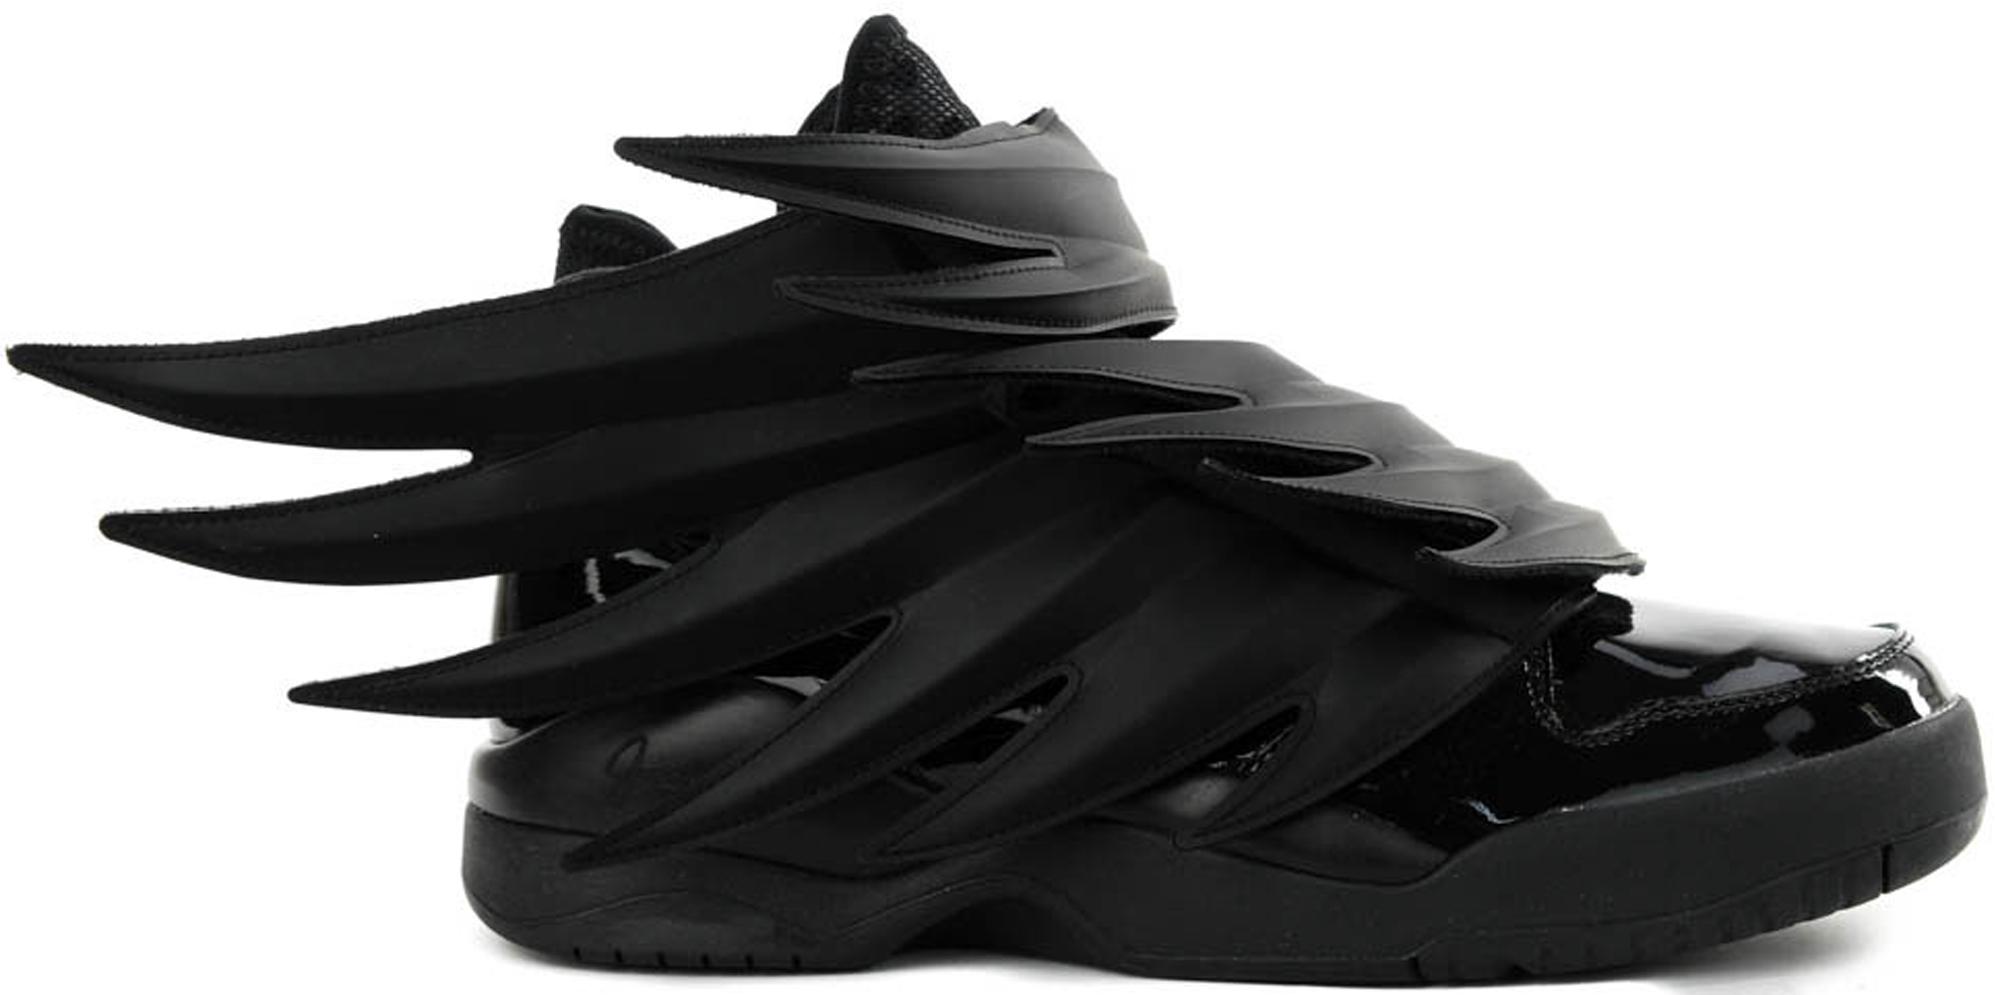 adidas Jeremy Scott Wings 3.0 Dark